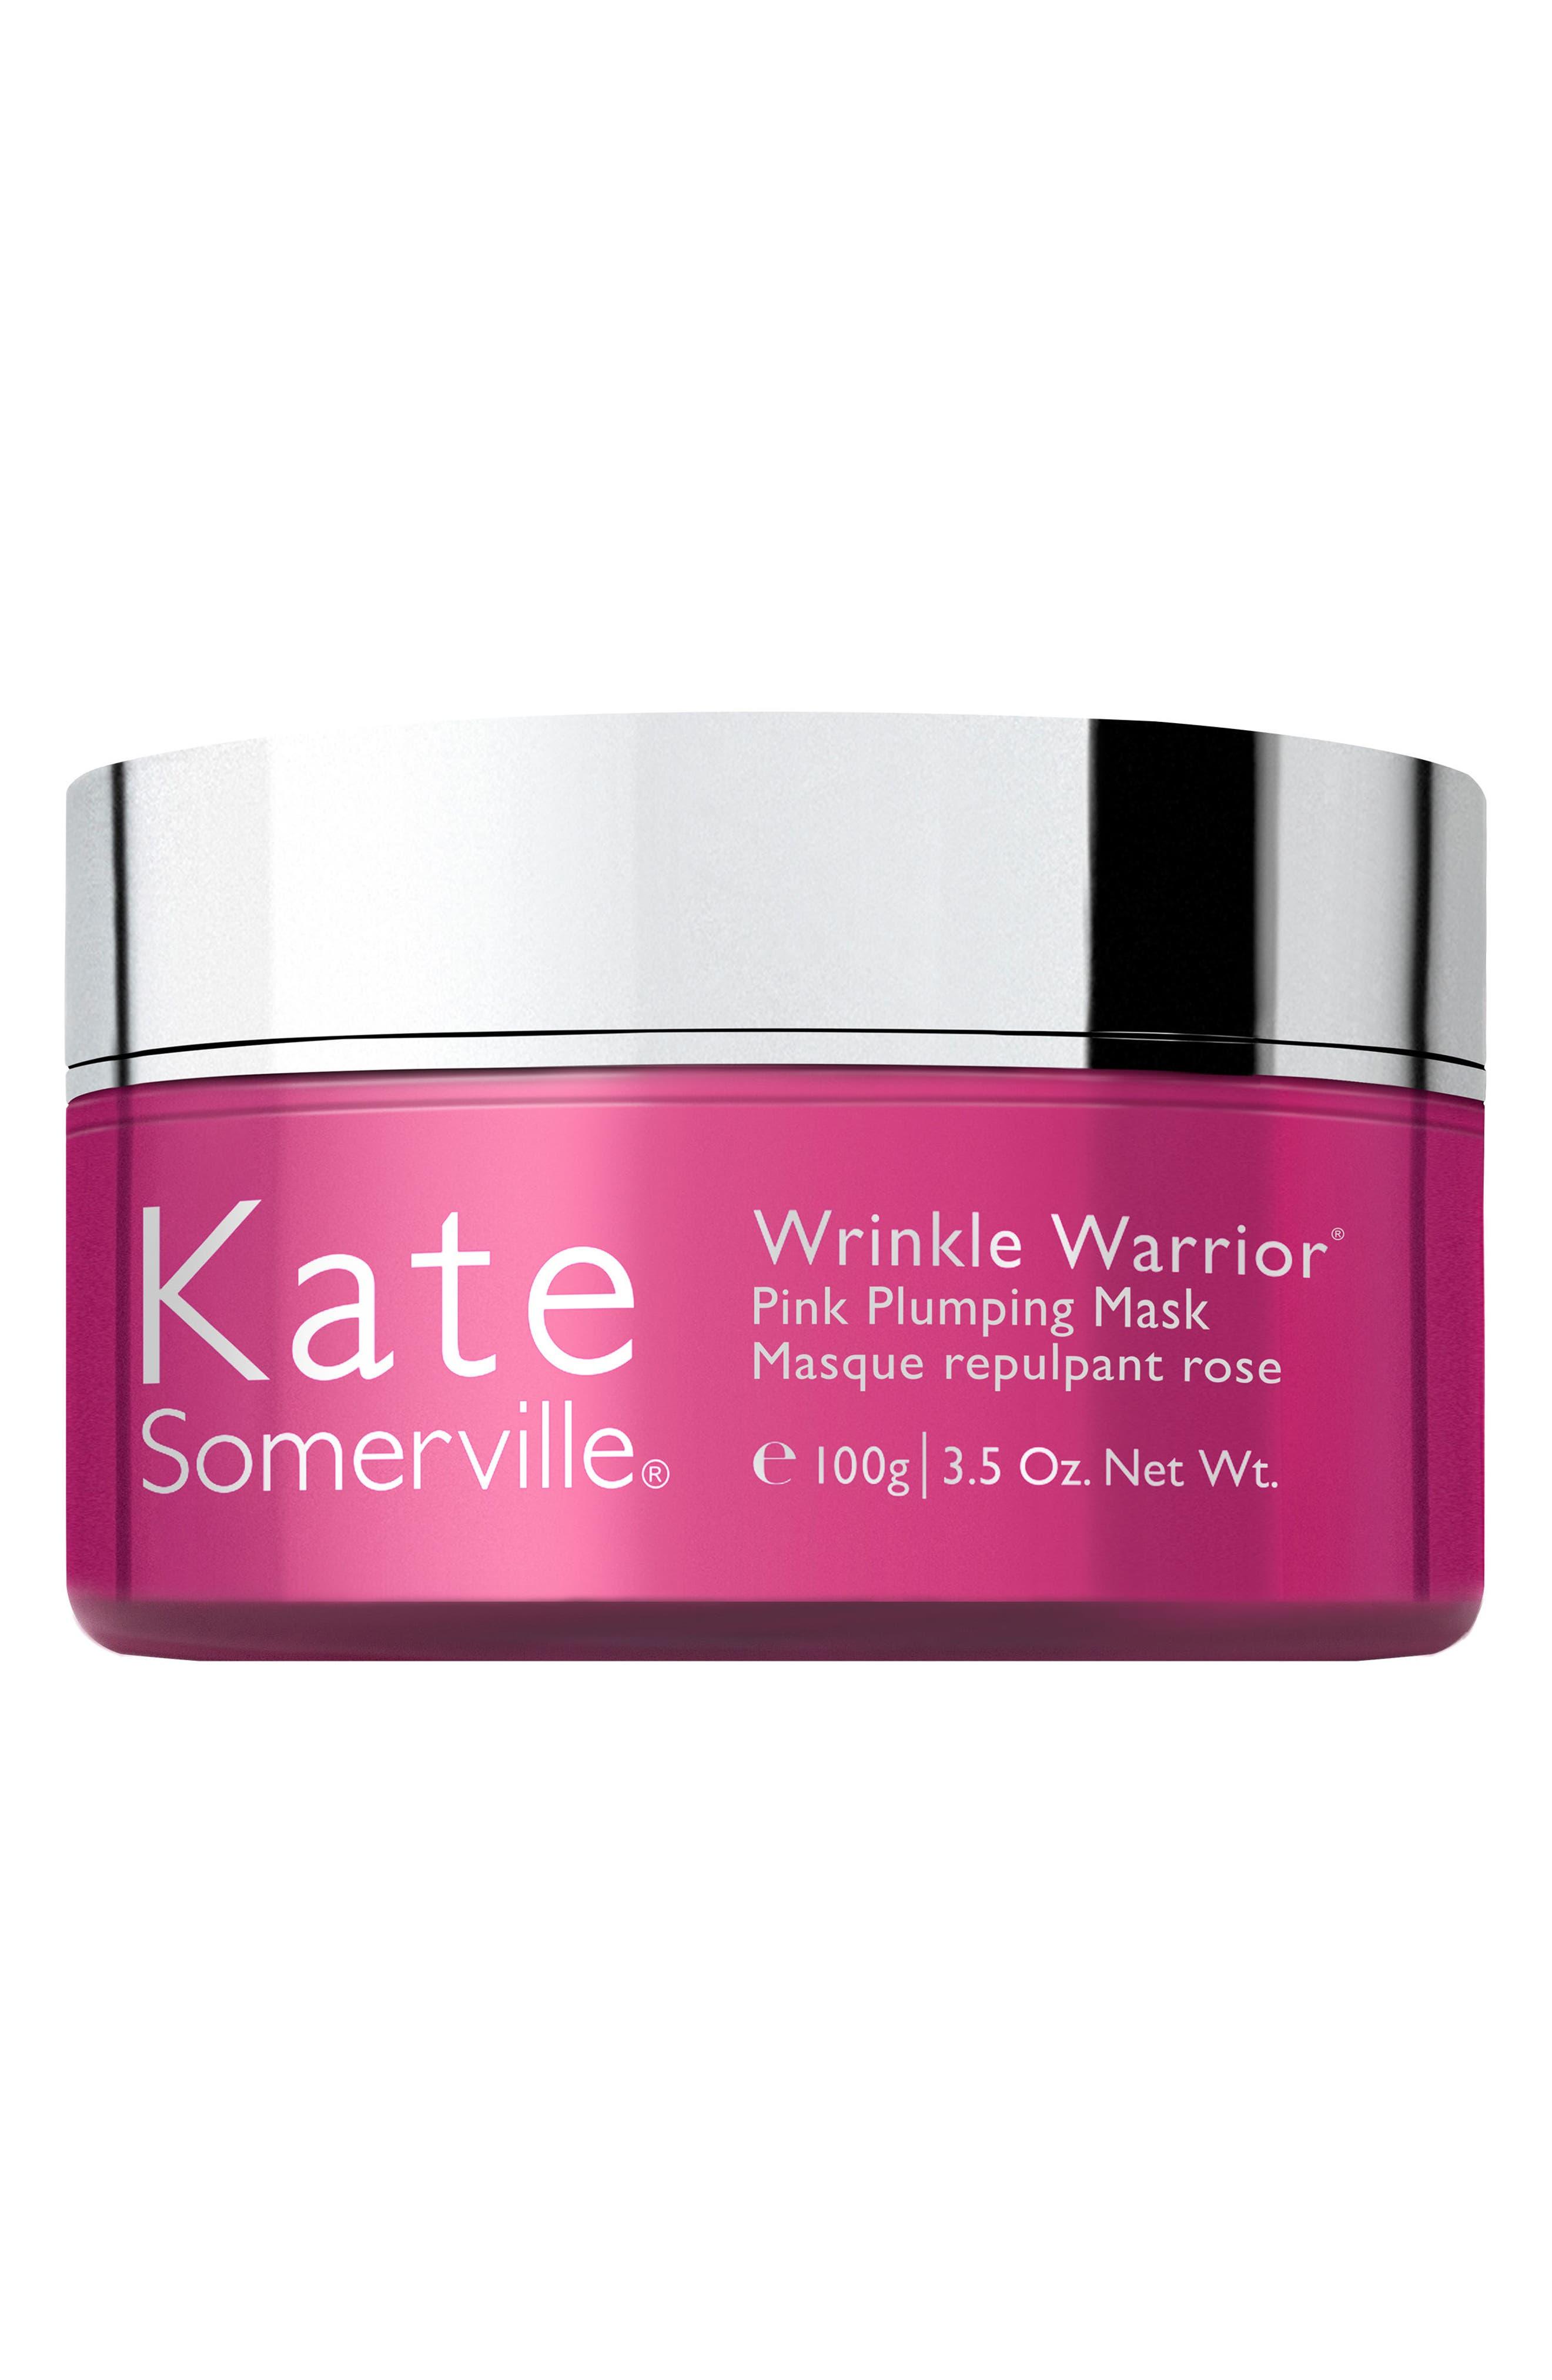 Kate Somerville® Wrinkle Warrior Plumping Mask